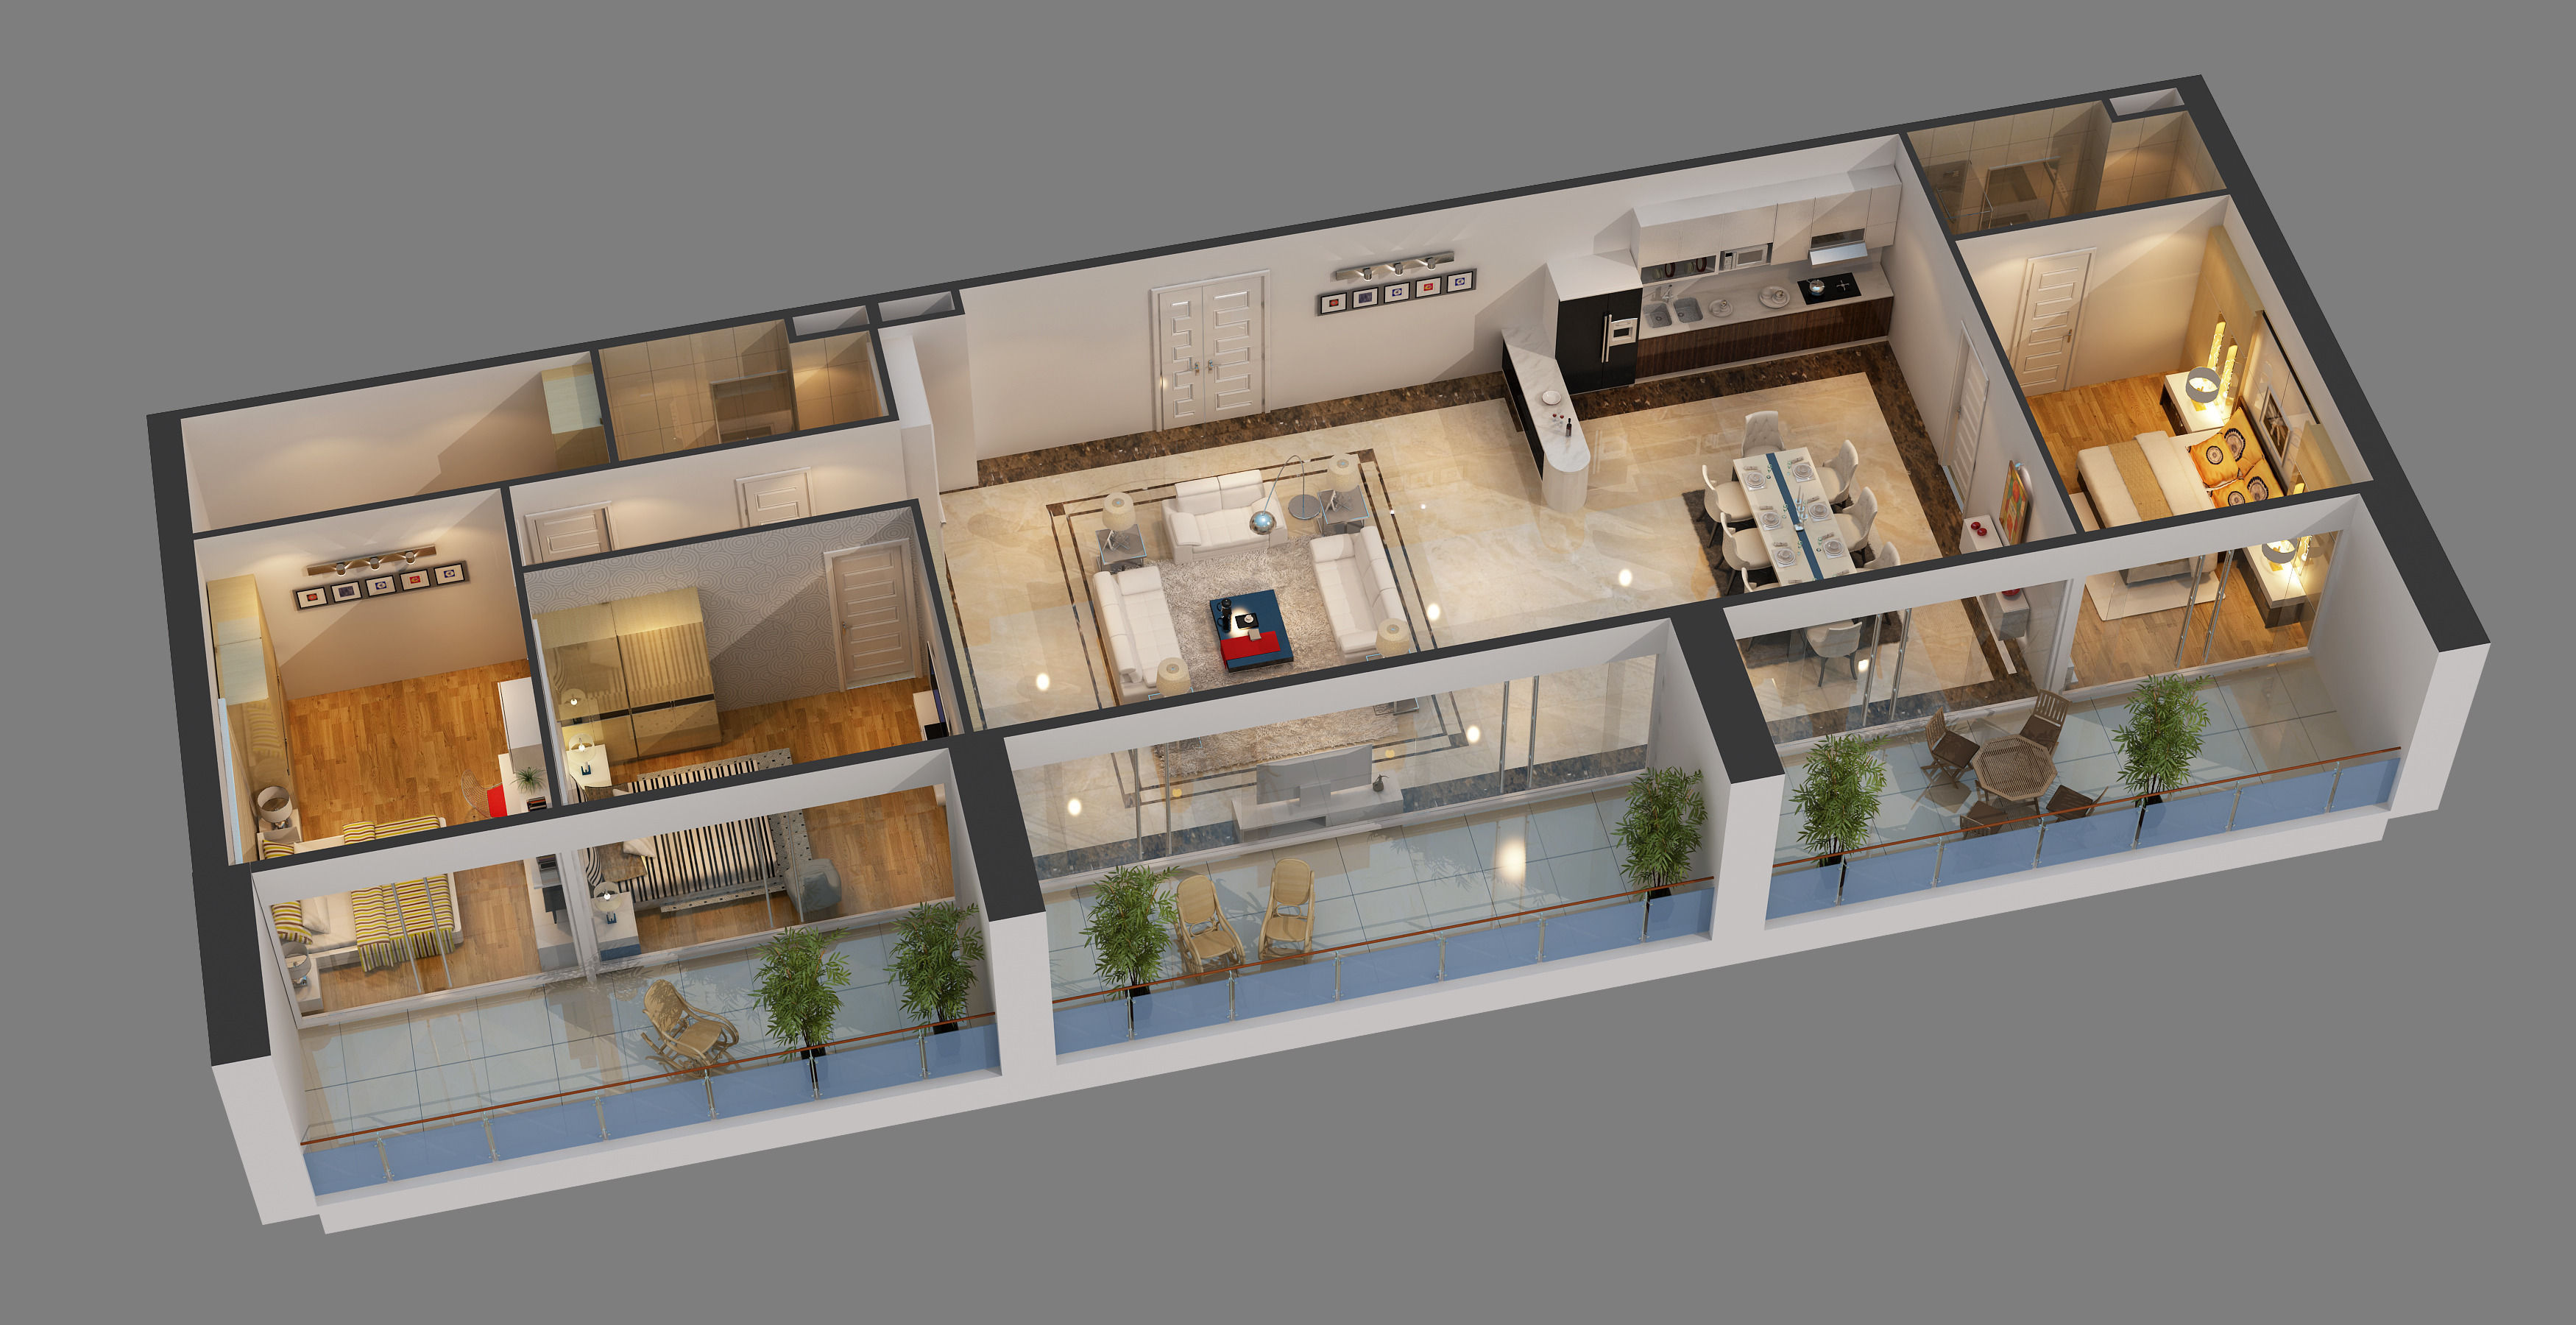 Superb ... Cutaway Apartment Full Furnitures In Modern Design 3d Model Max 2 ...